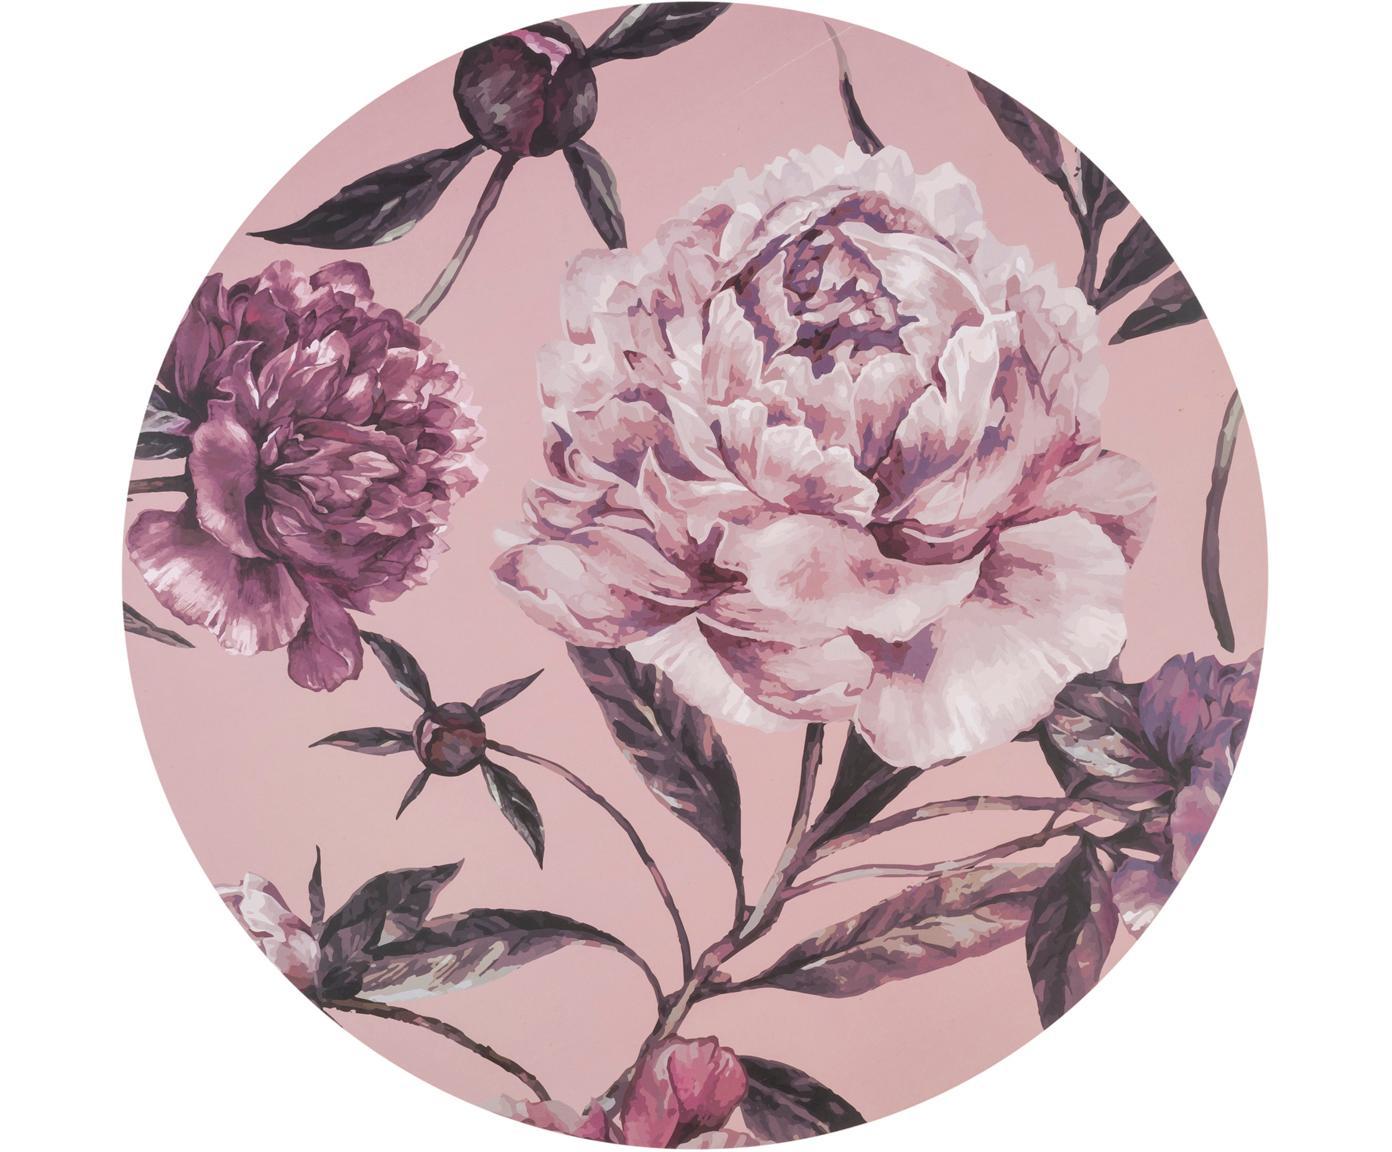 Ronde placemats Secret Garden, 2 stuks, Rozetinten, groentinten, Ø 38 cm